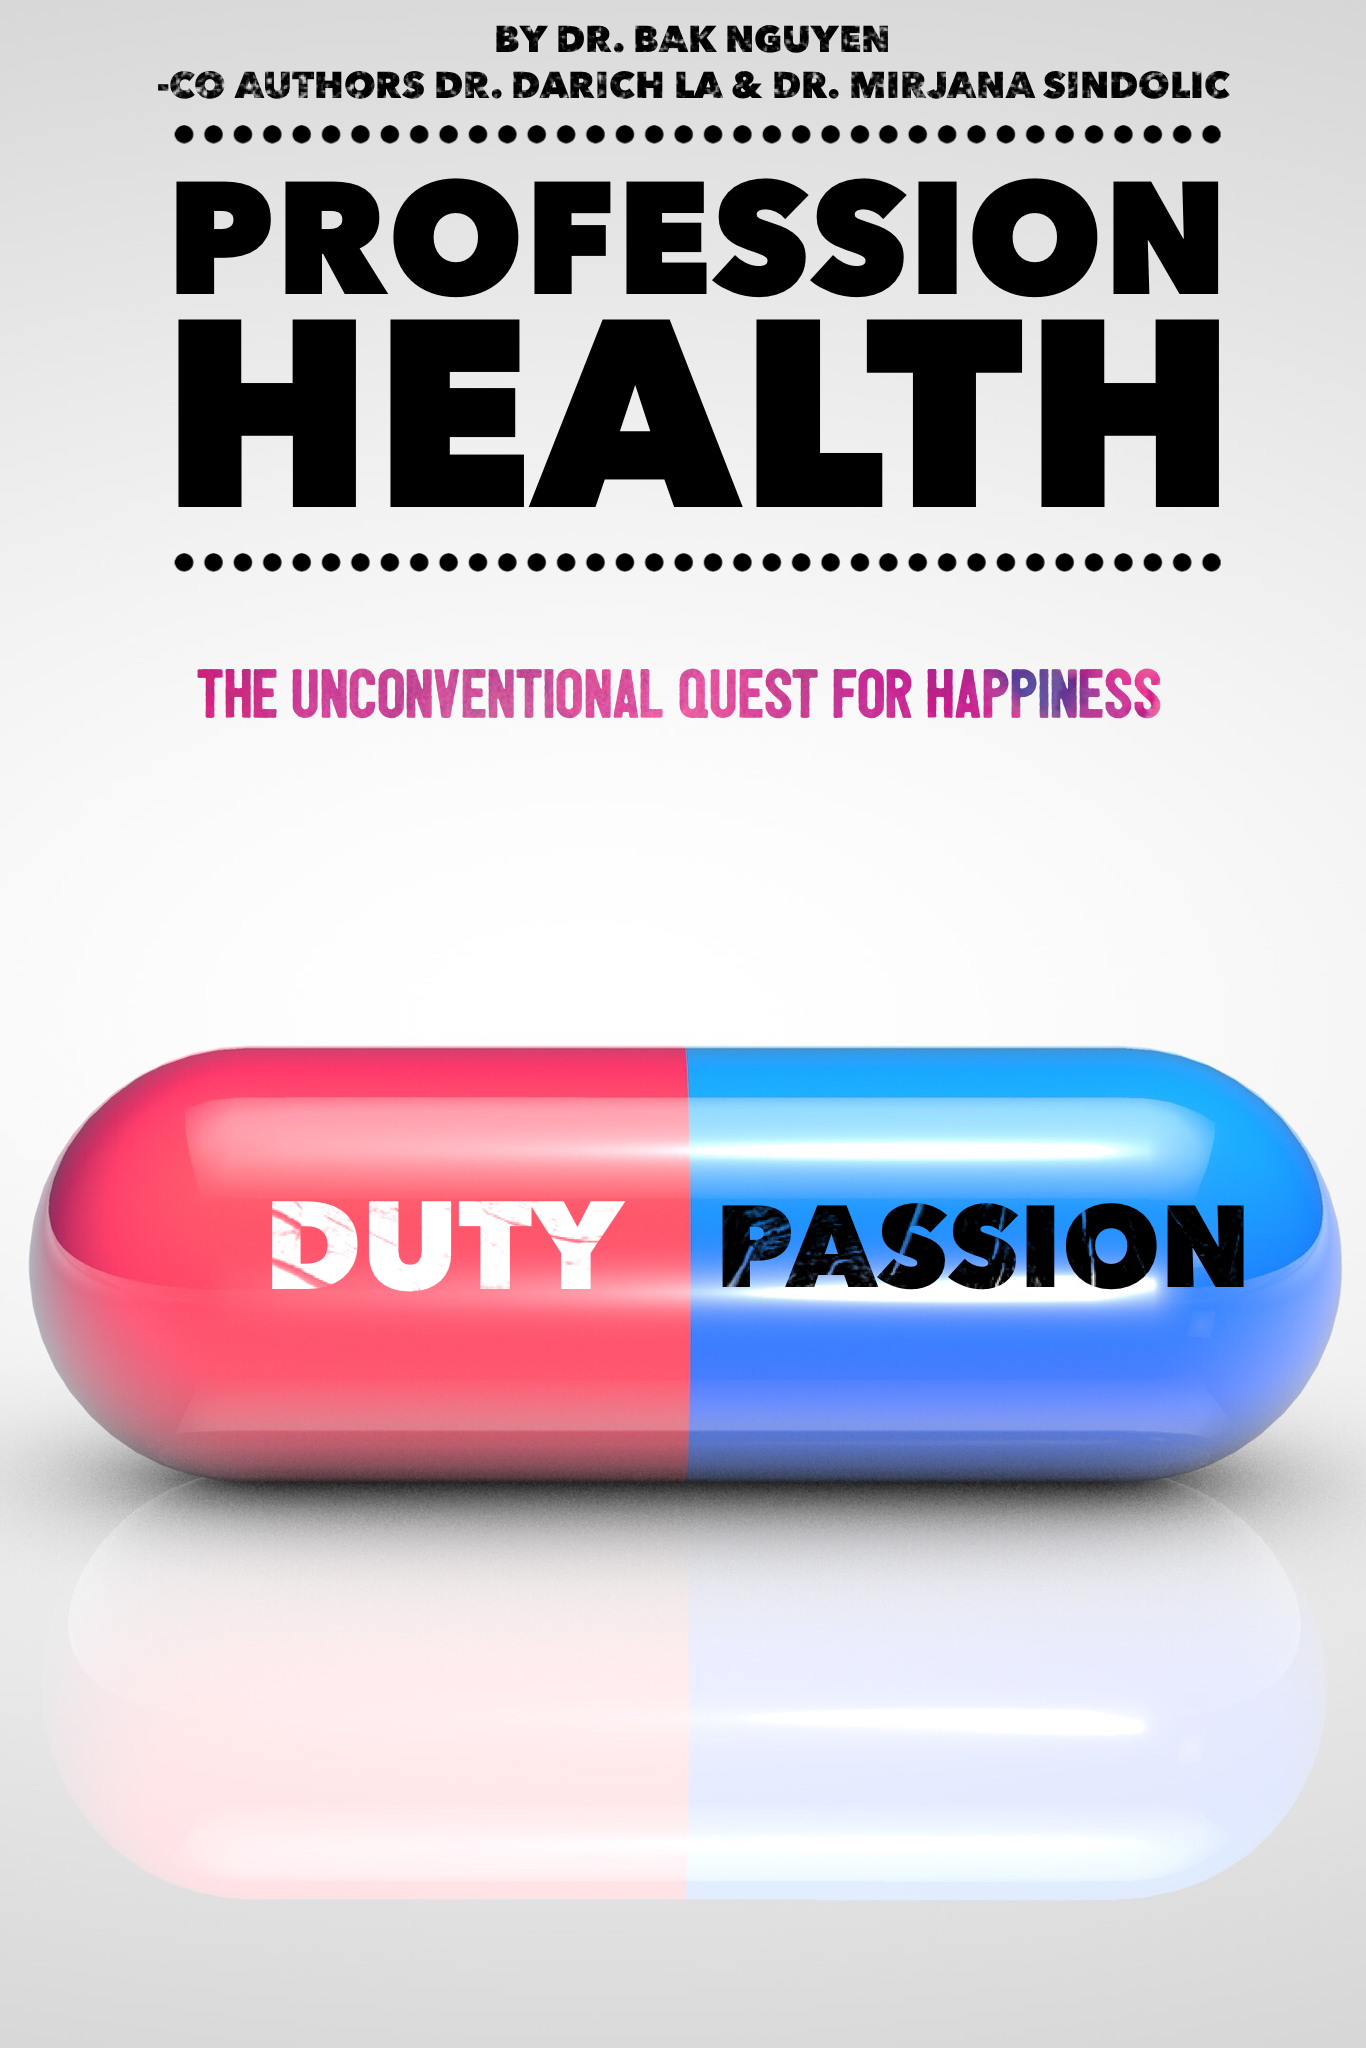 Copy of profession health